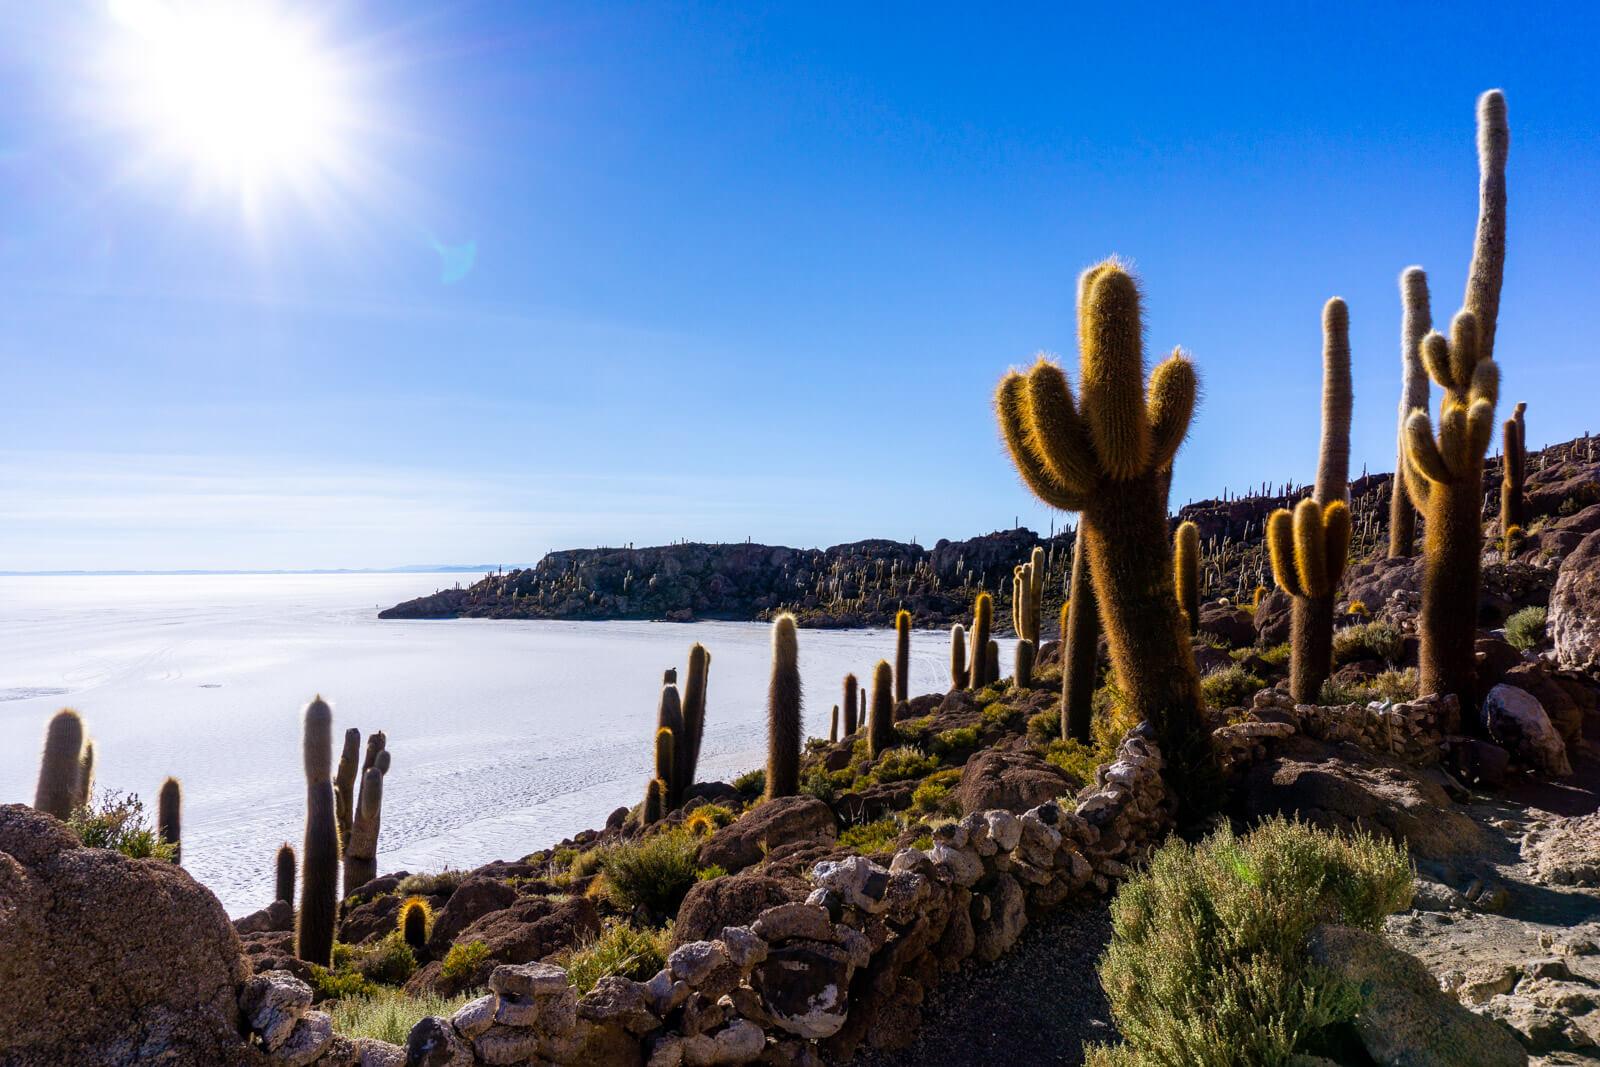 Hiking to the Top of the Cactus Island in the Salar de Uyuni